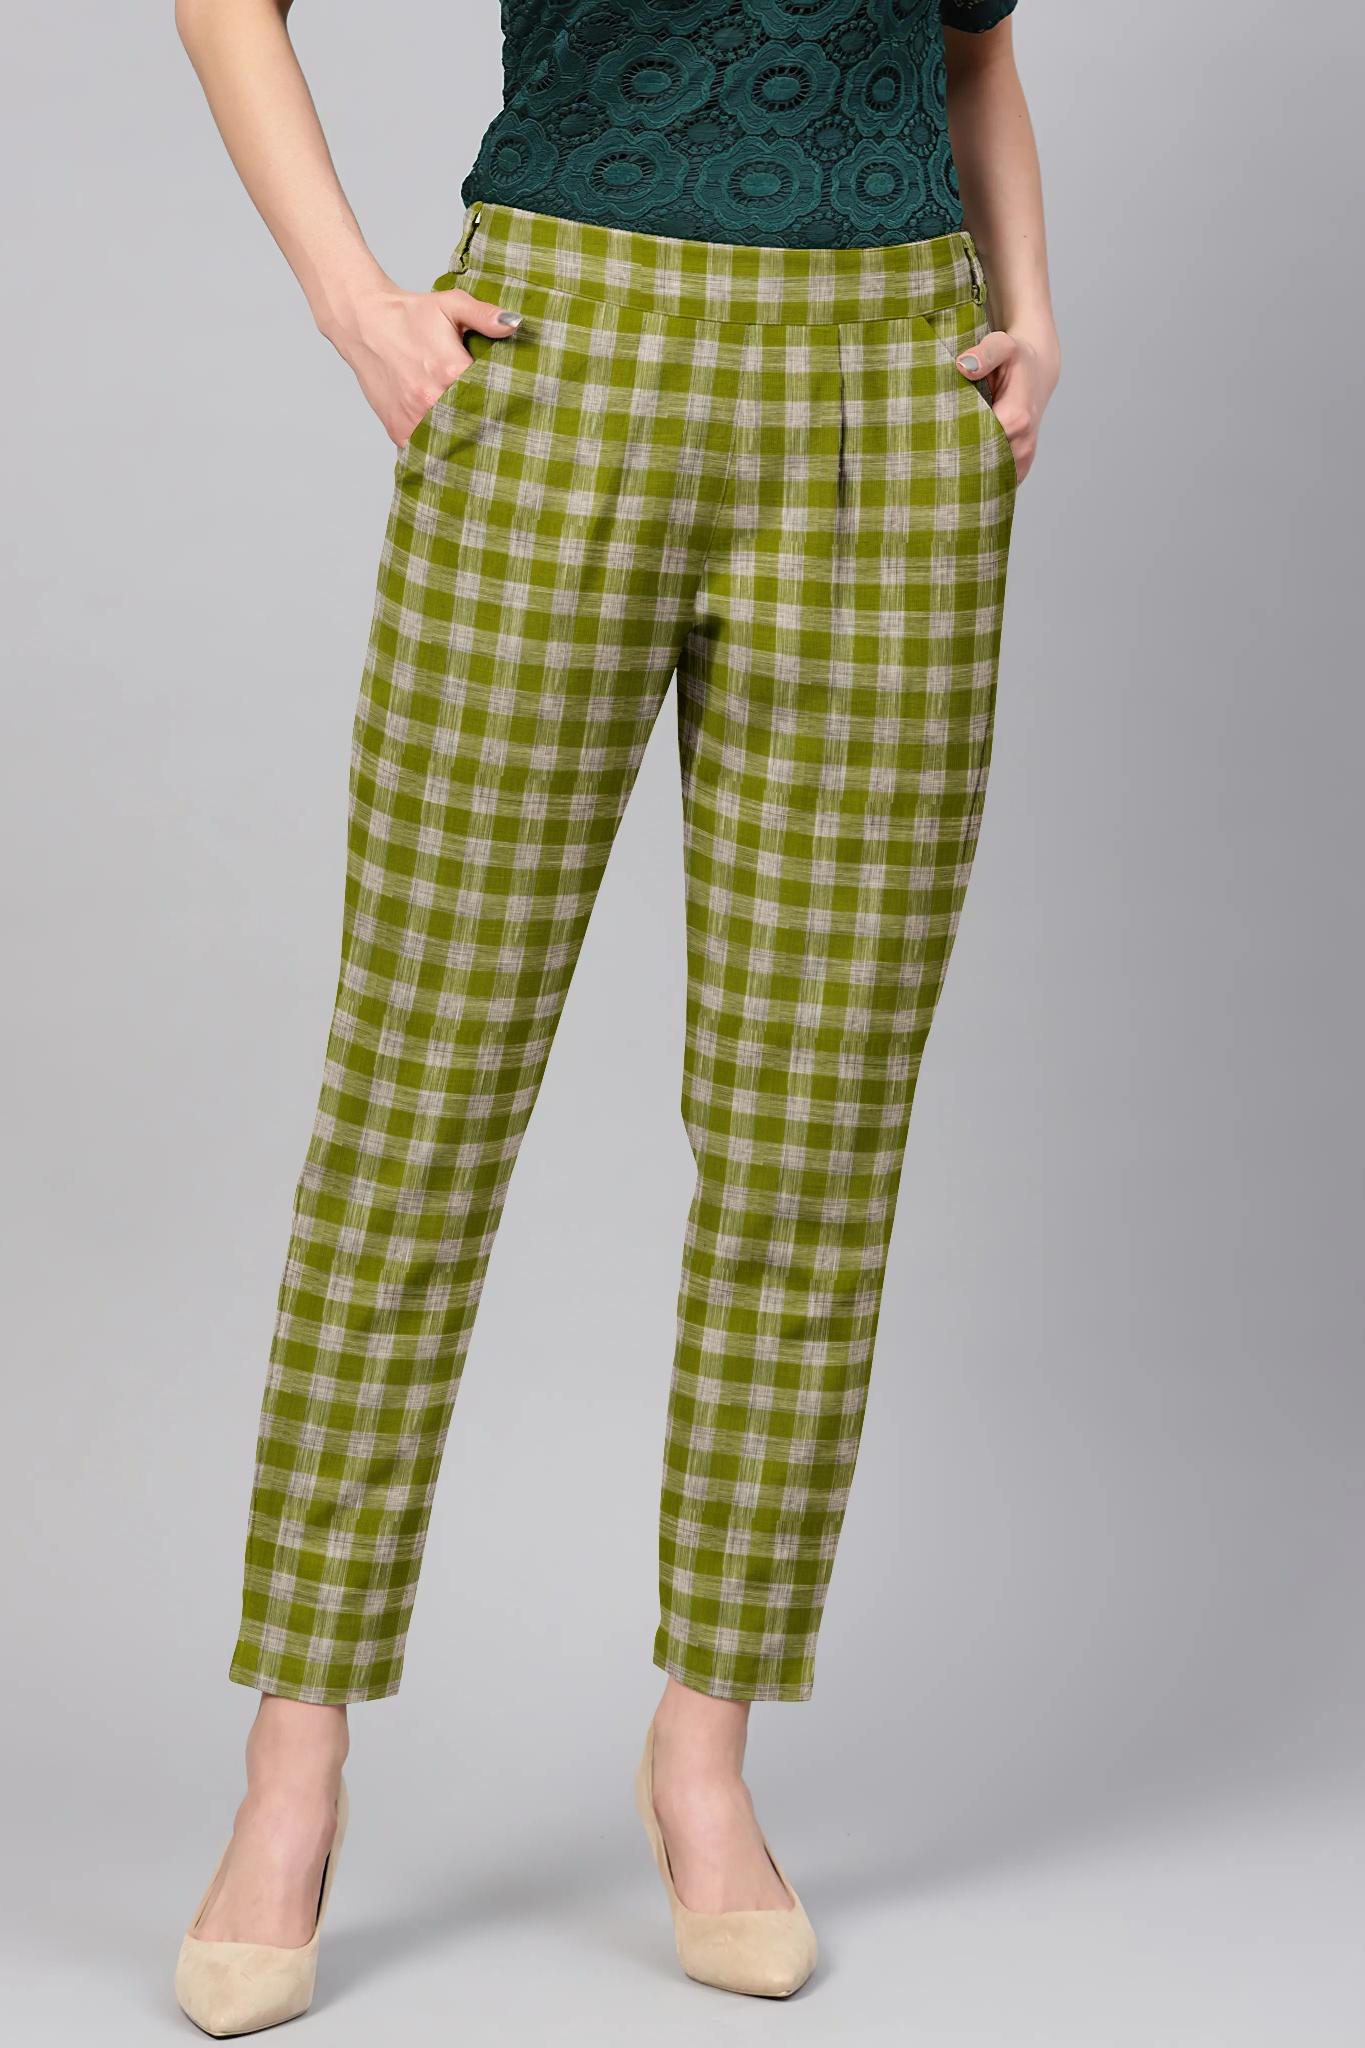 /home/customer/www/fabartcraft.com/public_html/uploadshttps://www.shopolics.com/uploads/images/medium/Green-White-Cotton-Check-Regular-Fit-Solid-Trouser-36082.jpg